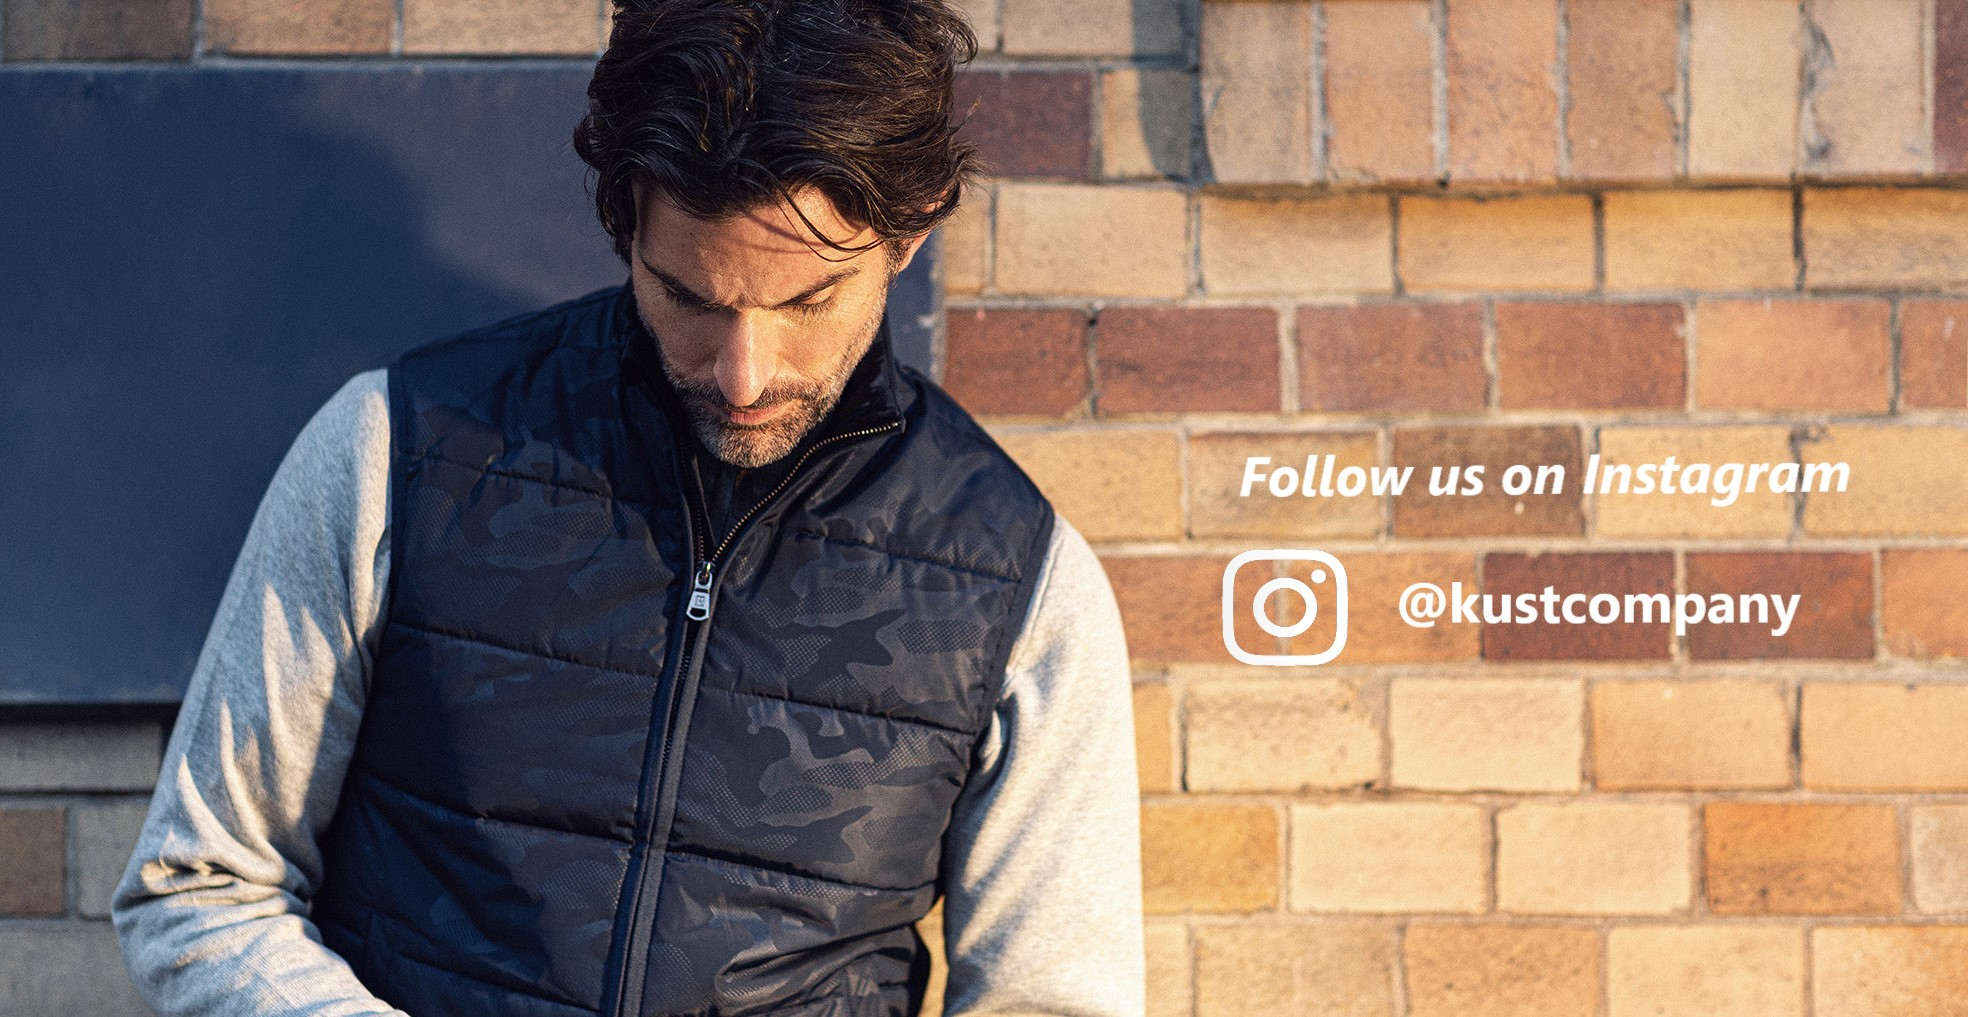 Kustcompany.com on instagram